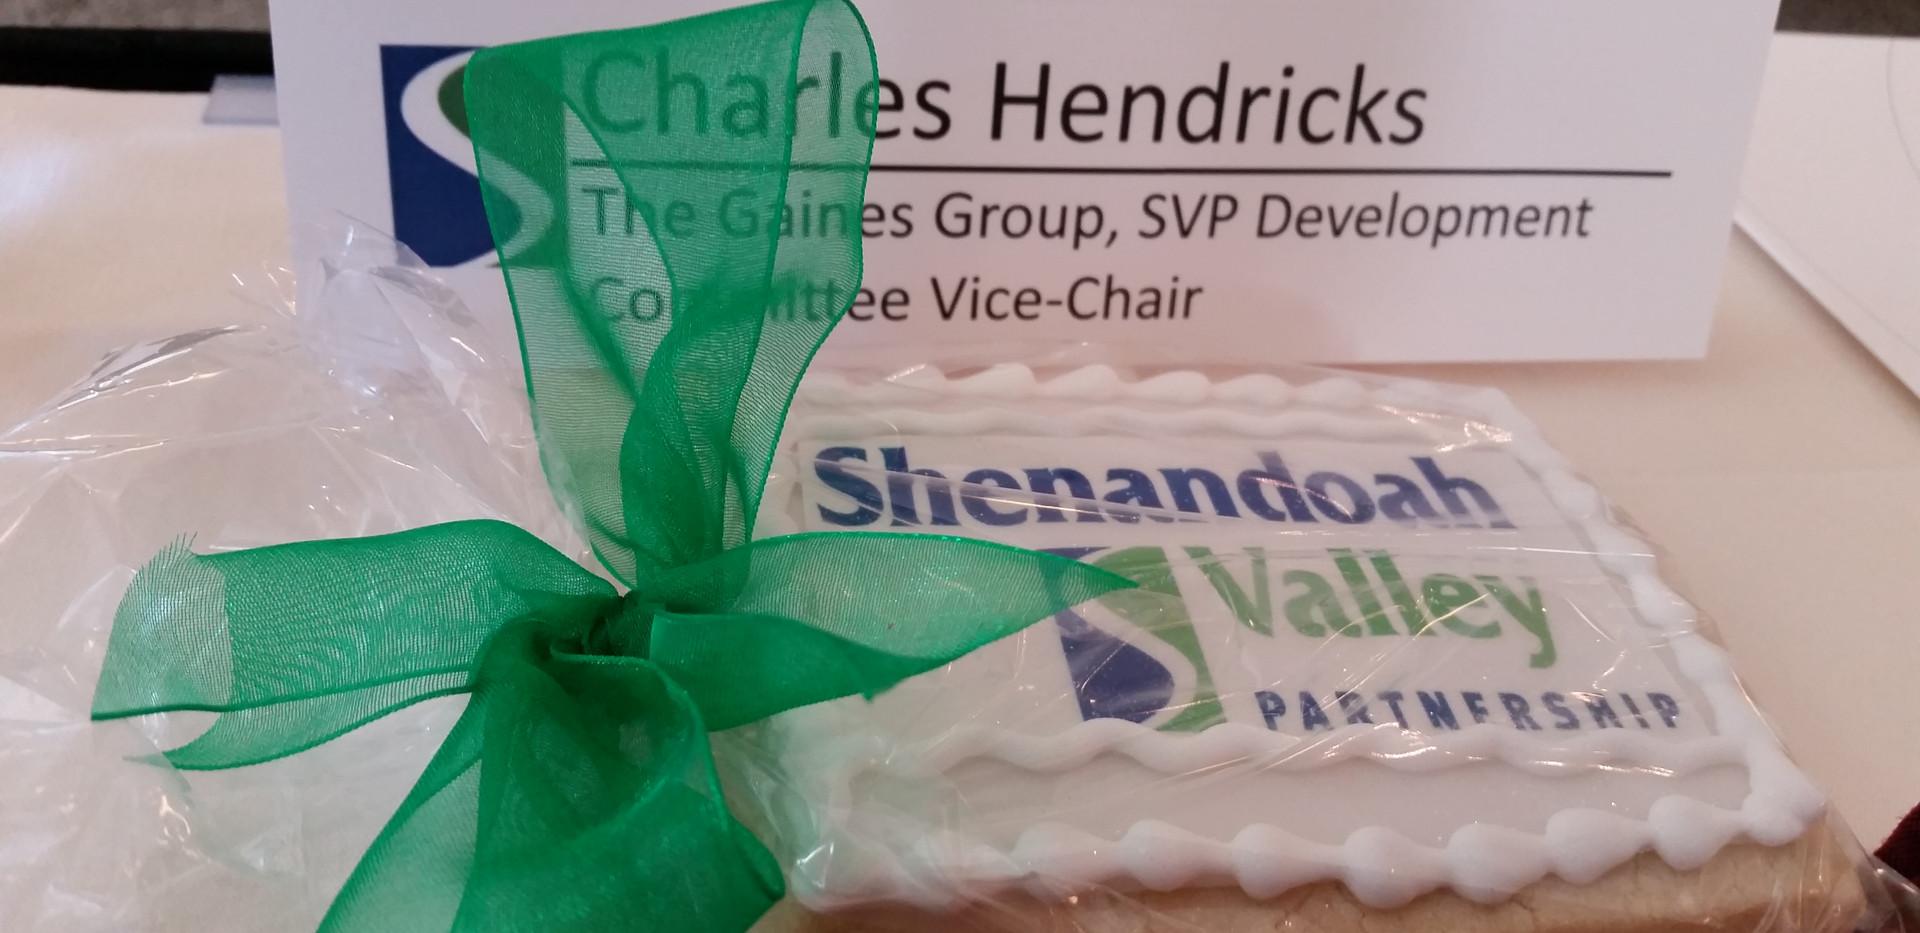 Shenandoah Valley Partnership